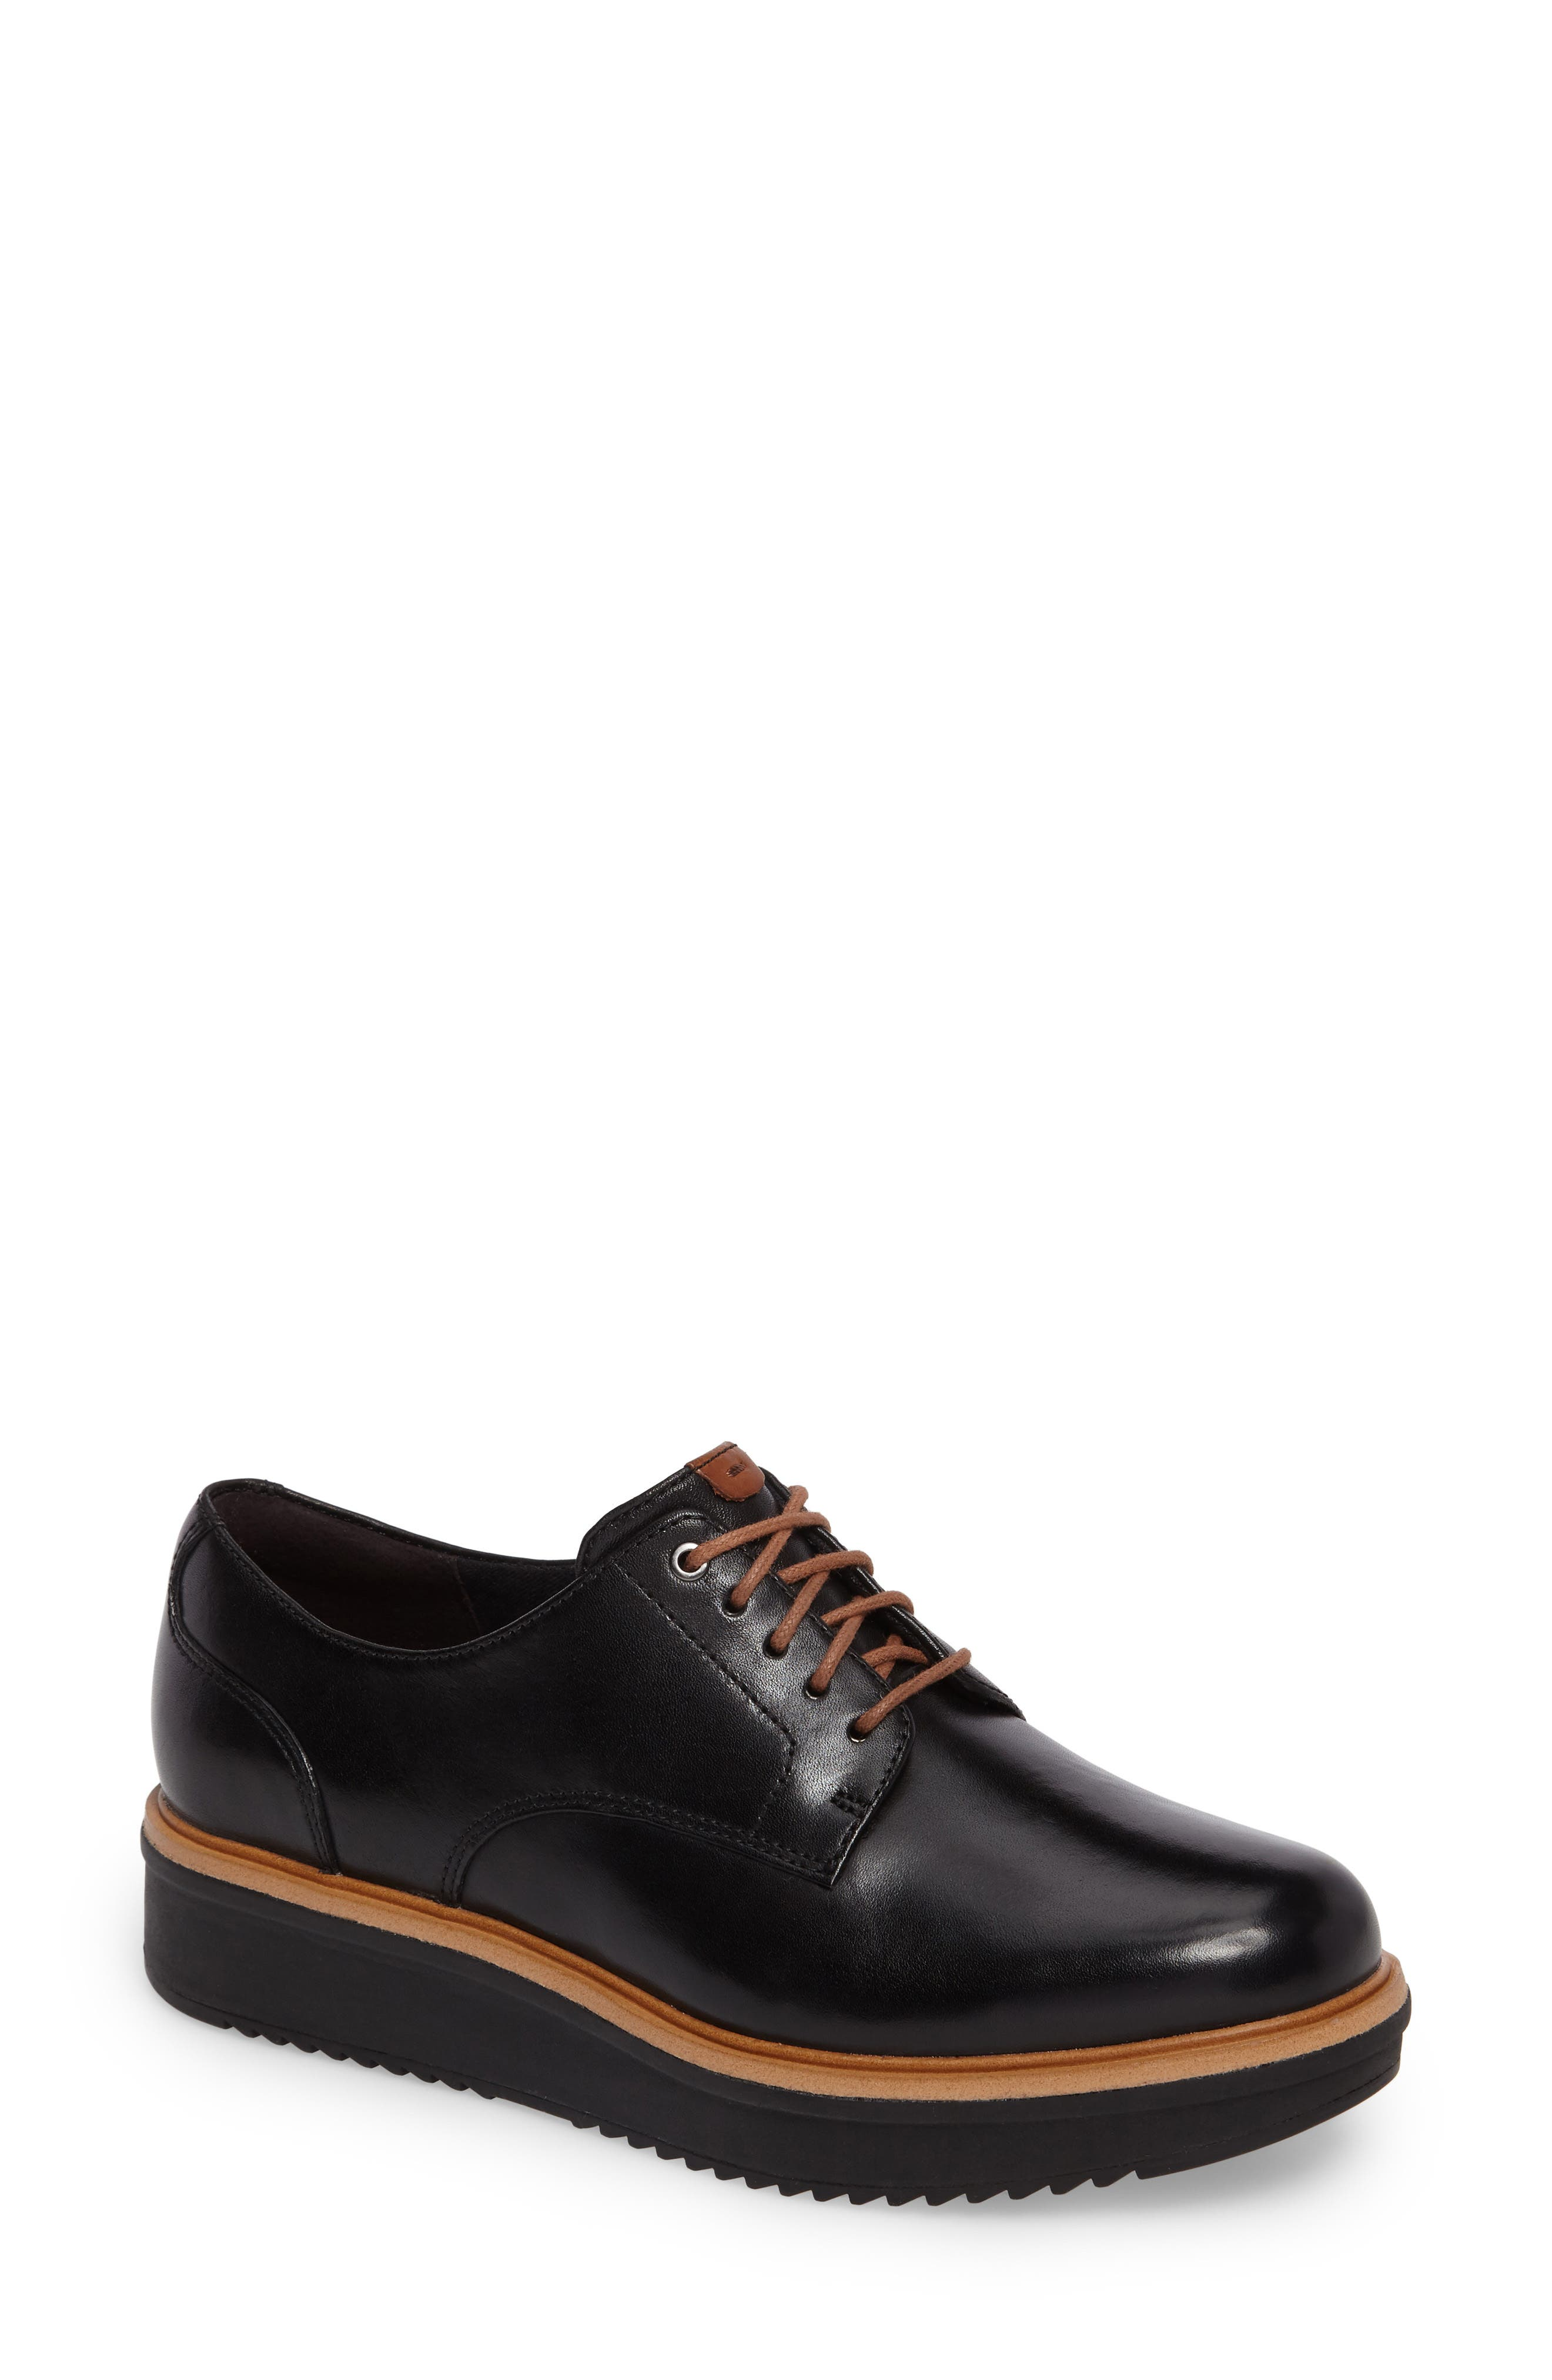 Teadale Rhea Platform Oxford,                         Main,                         color, Black Leather